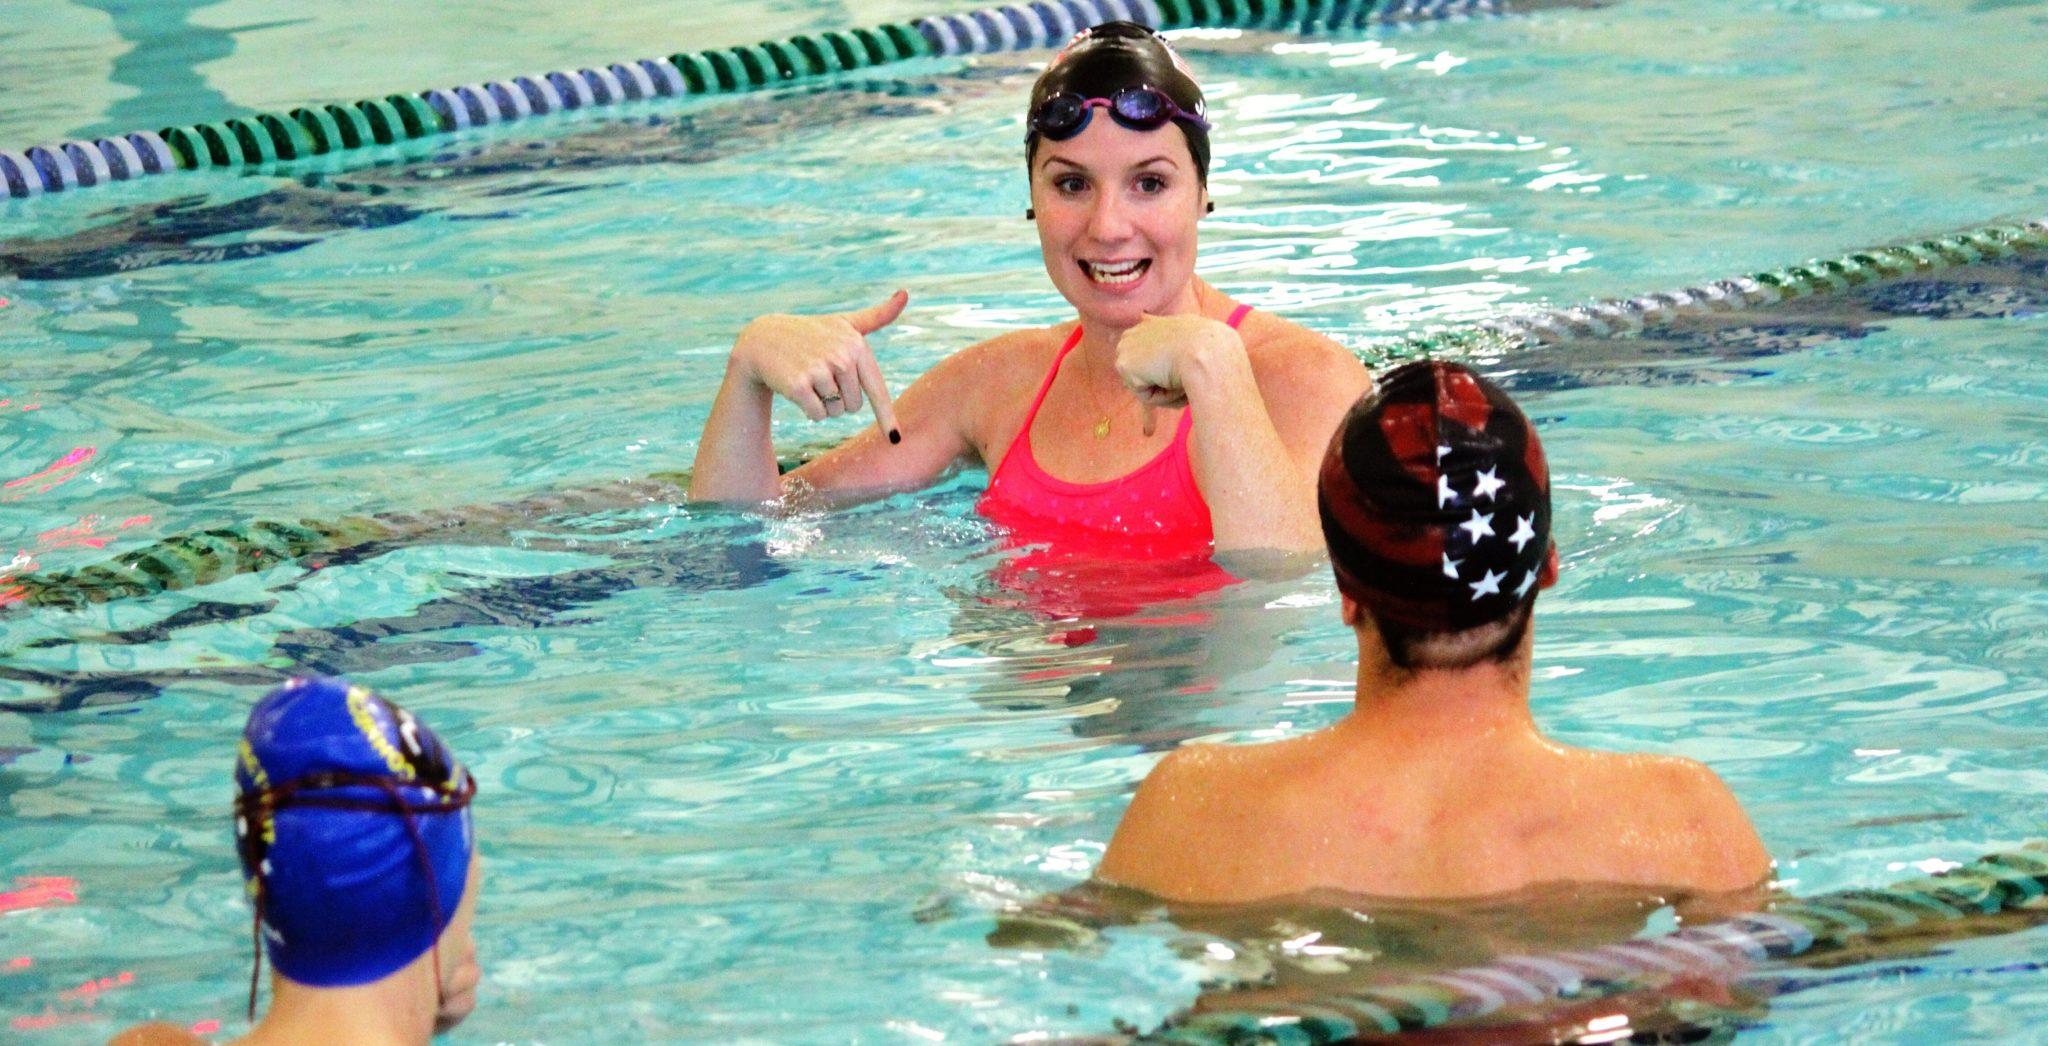 Kara lynn joyce working with swimmers on technique madison nj elite